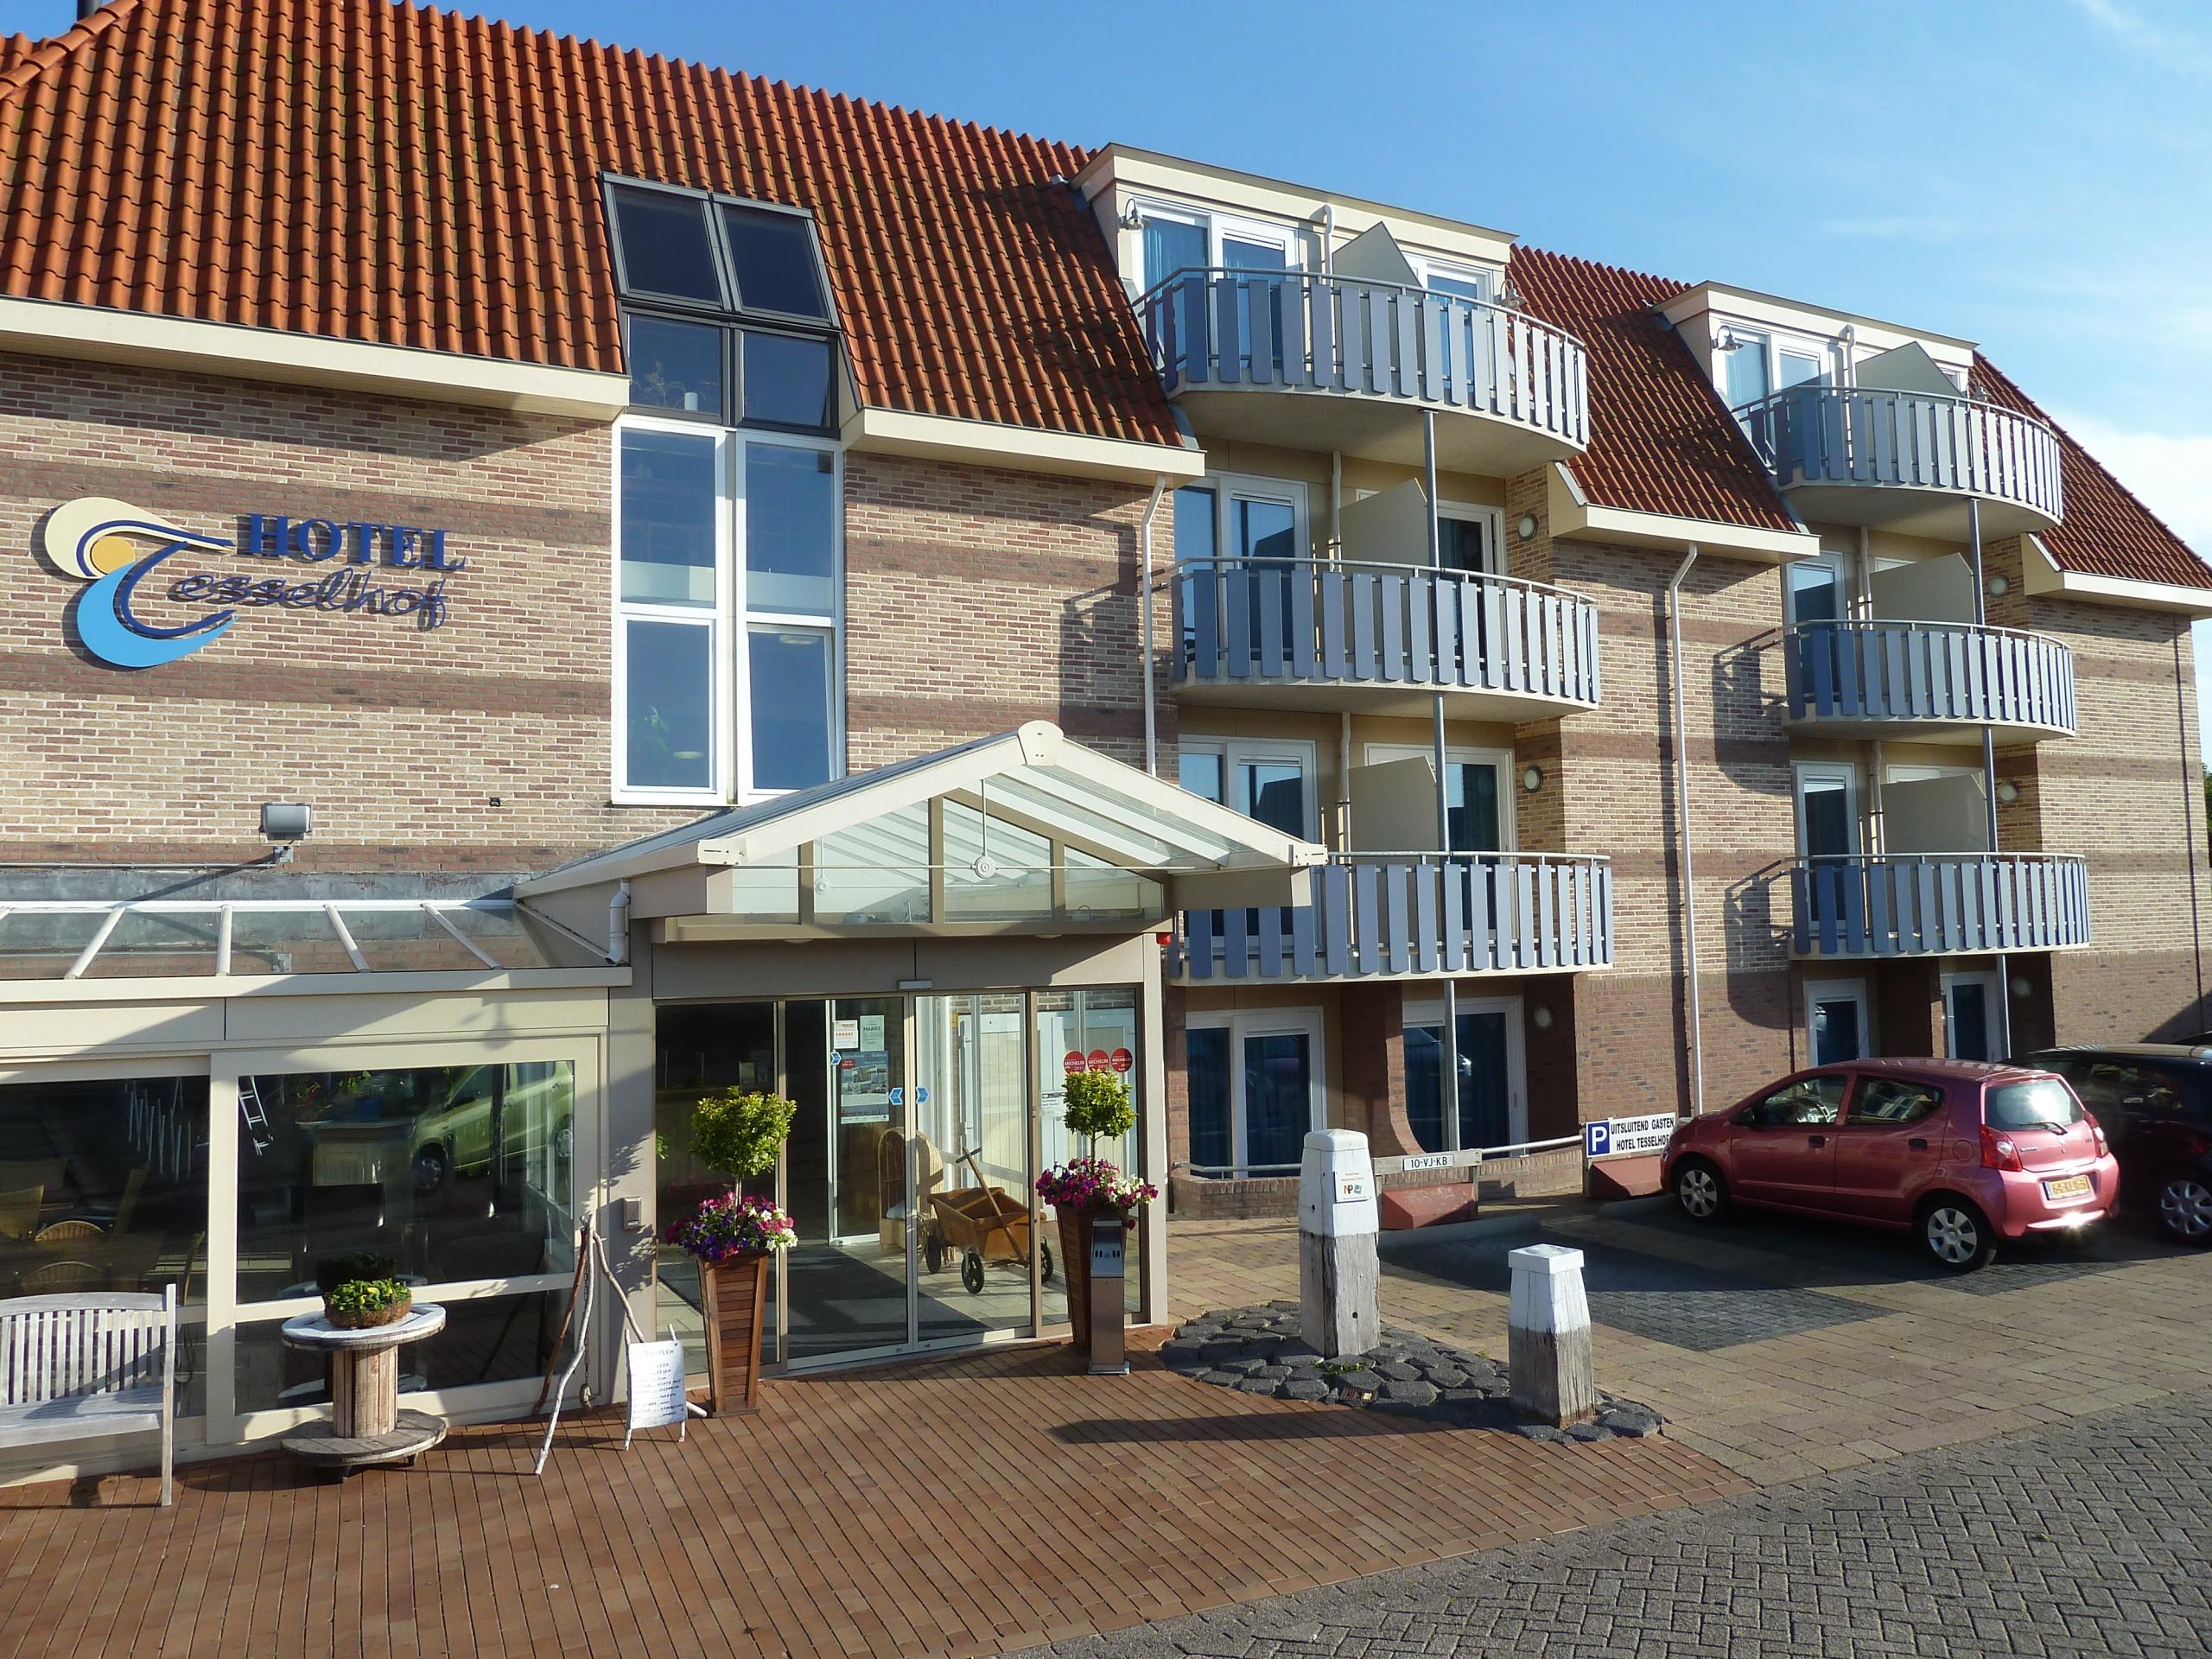 Spacious hotel room with wheelchair-accessible balcony in De Koog